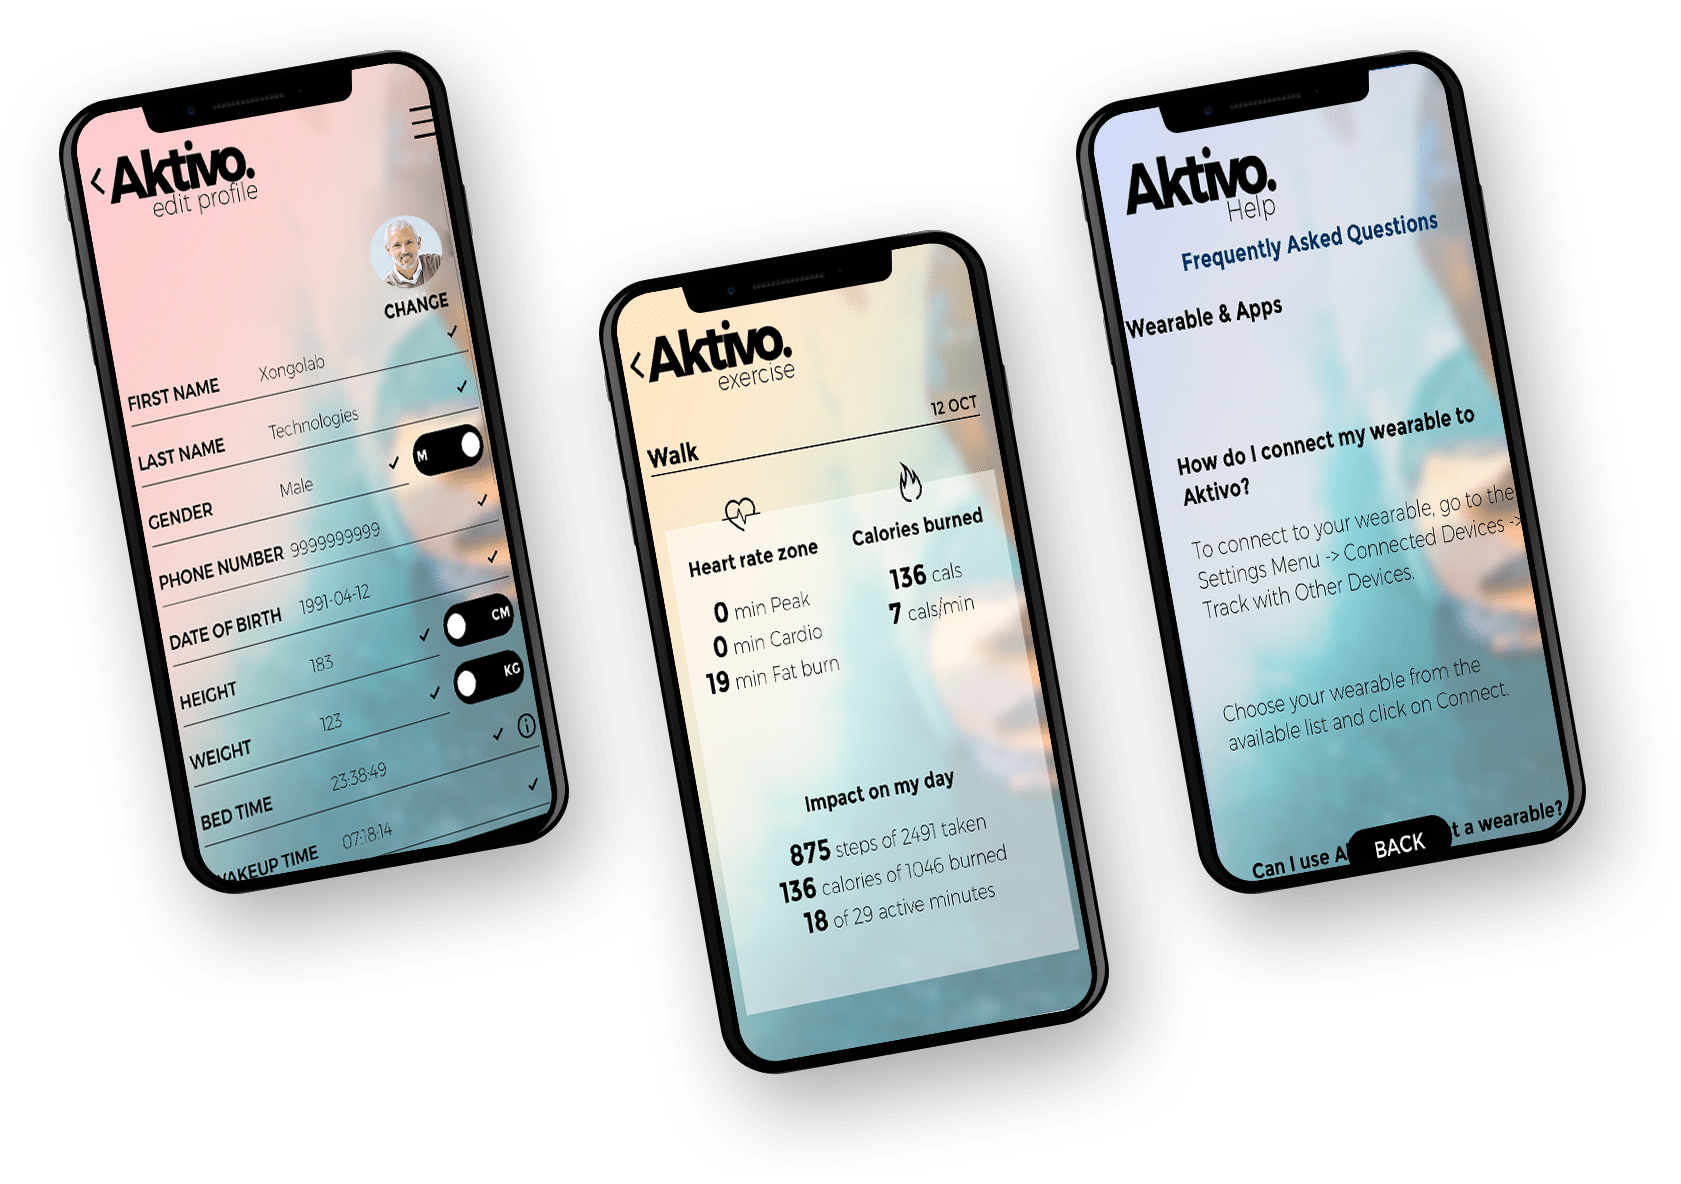 aktivo screens